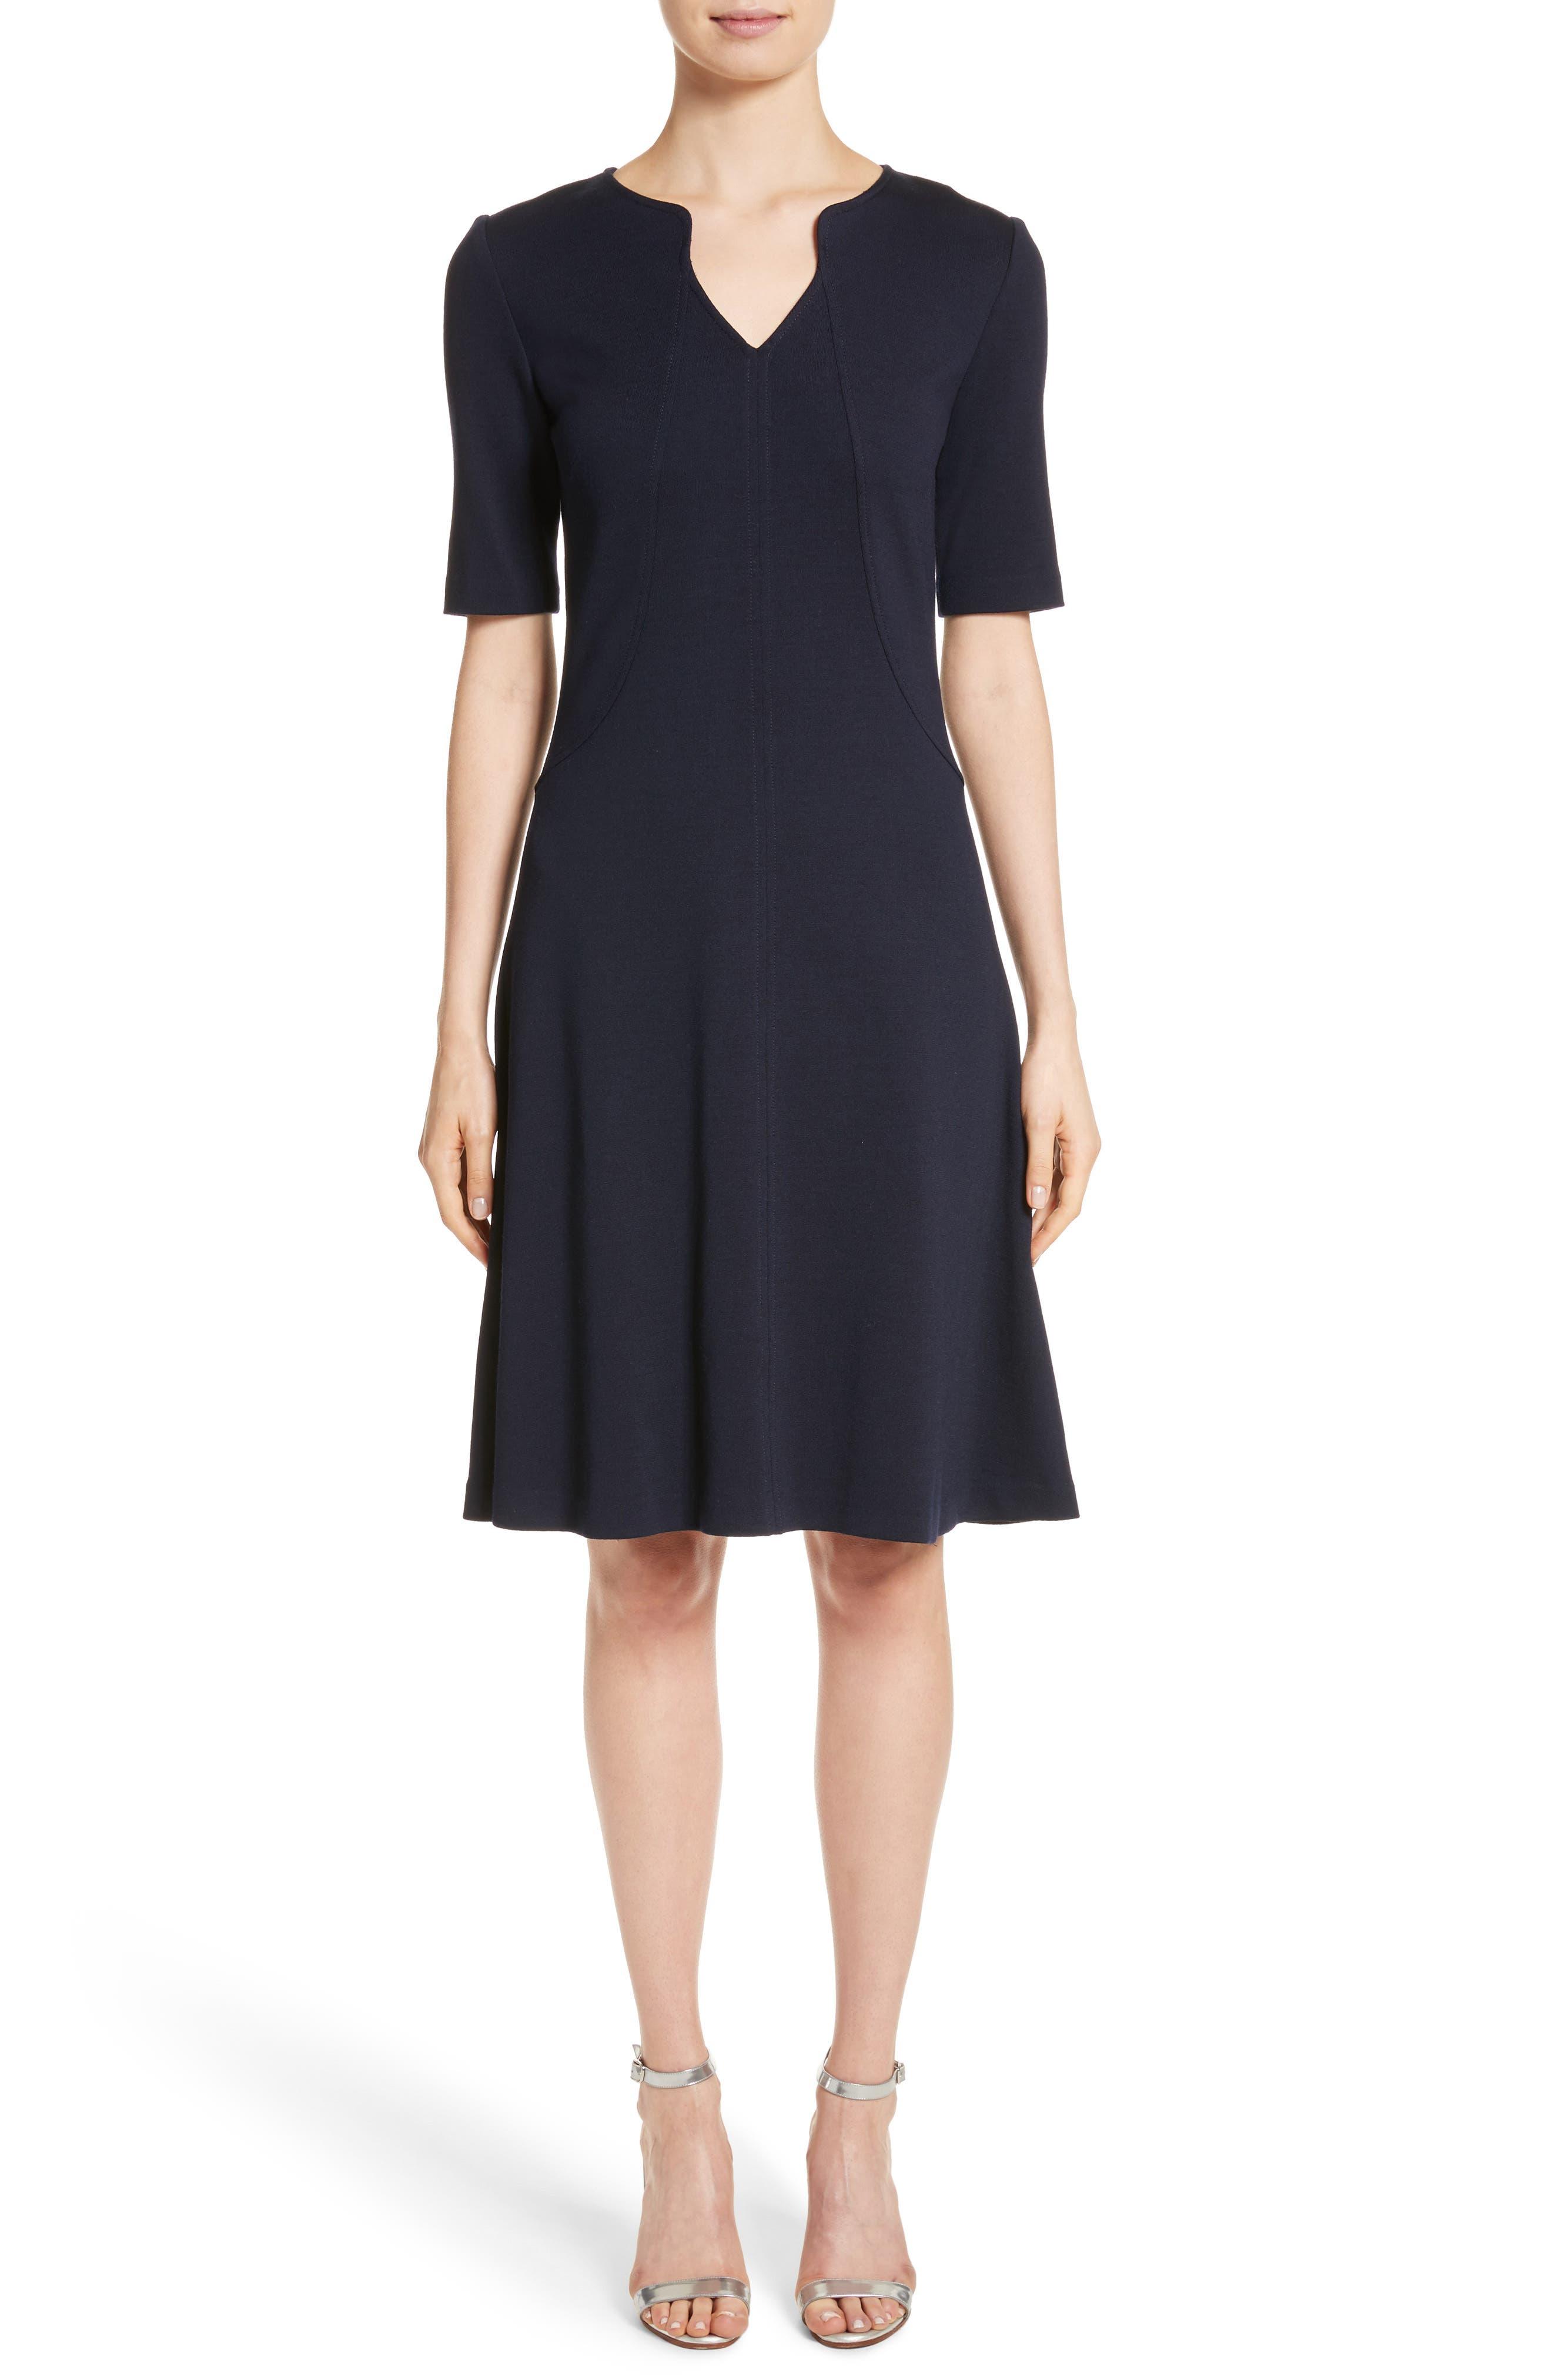 St. John Collection Milano Knit A-Line Dress